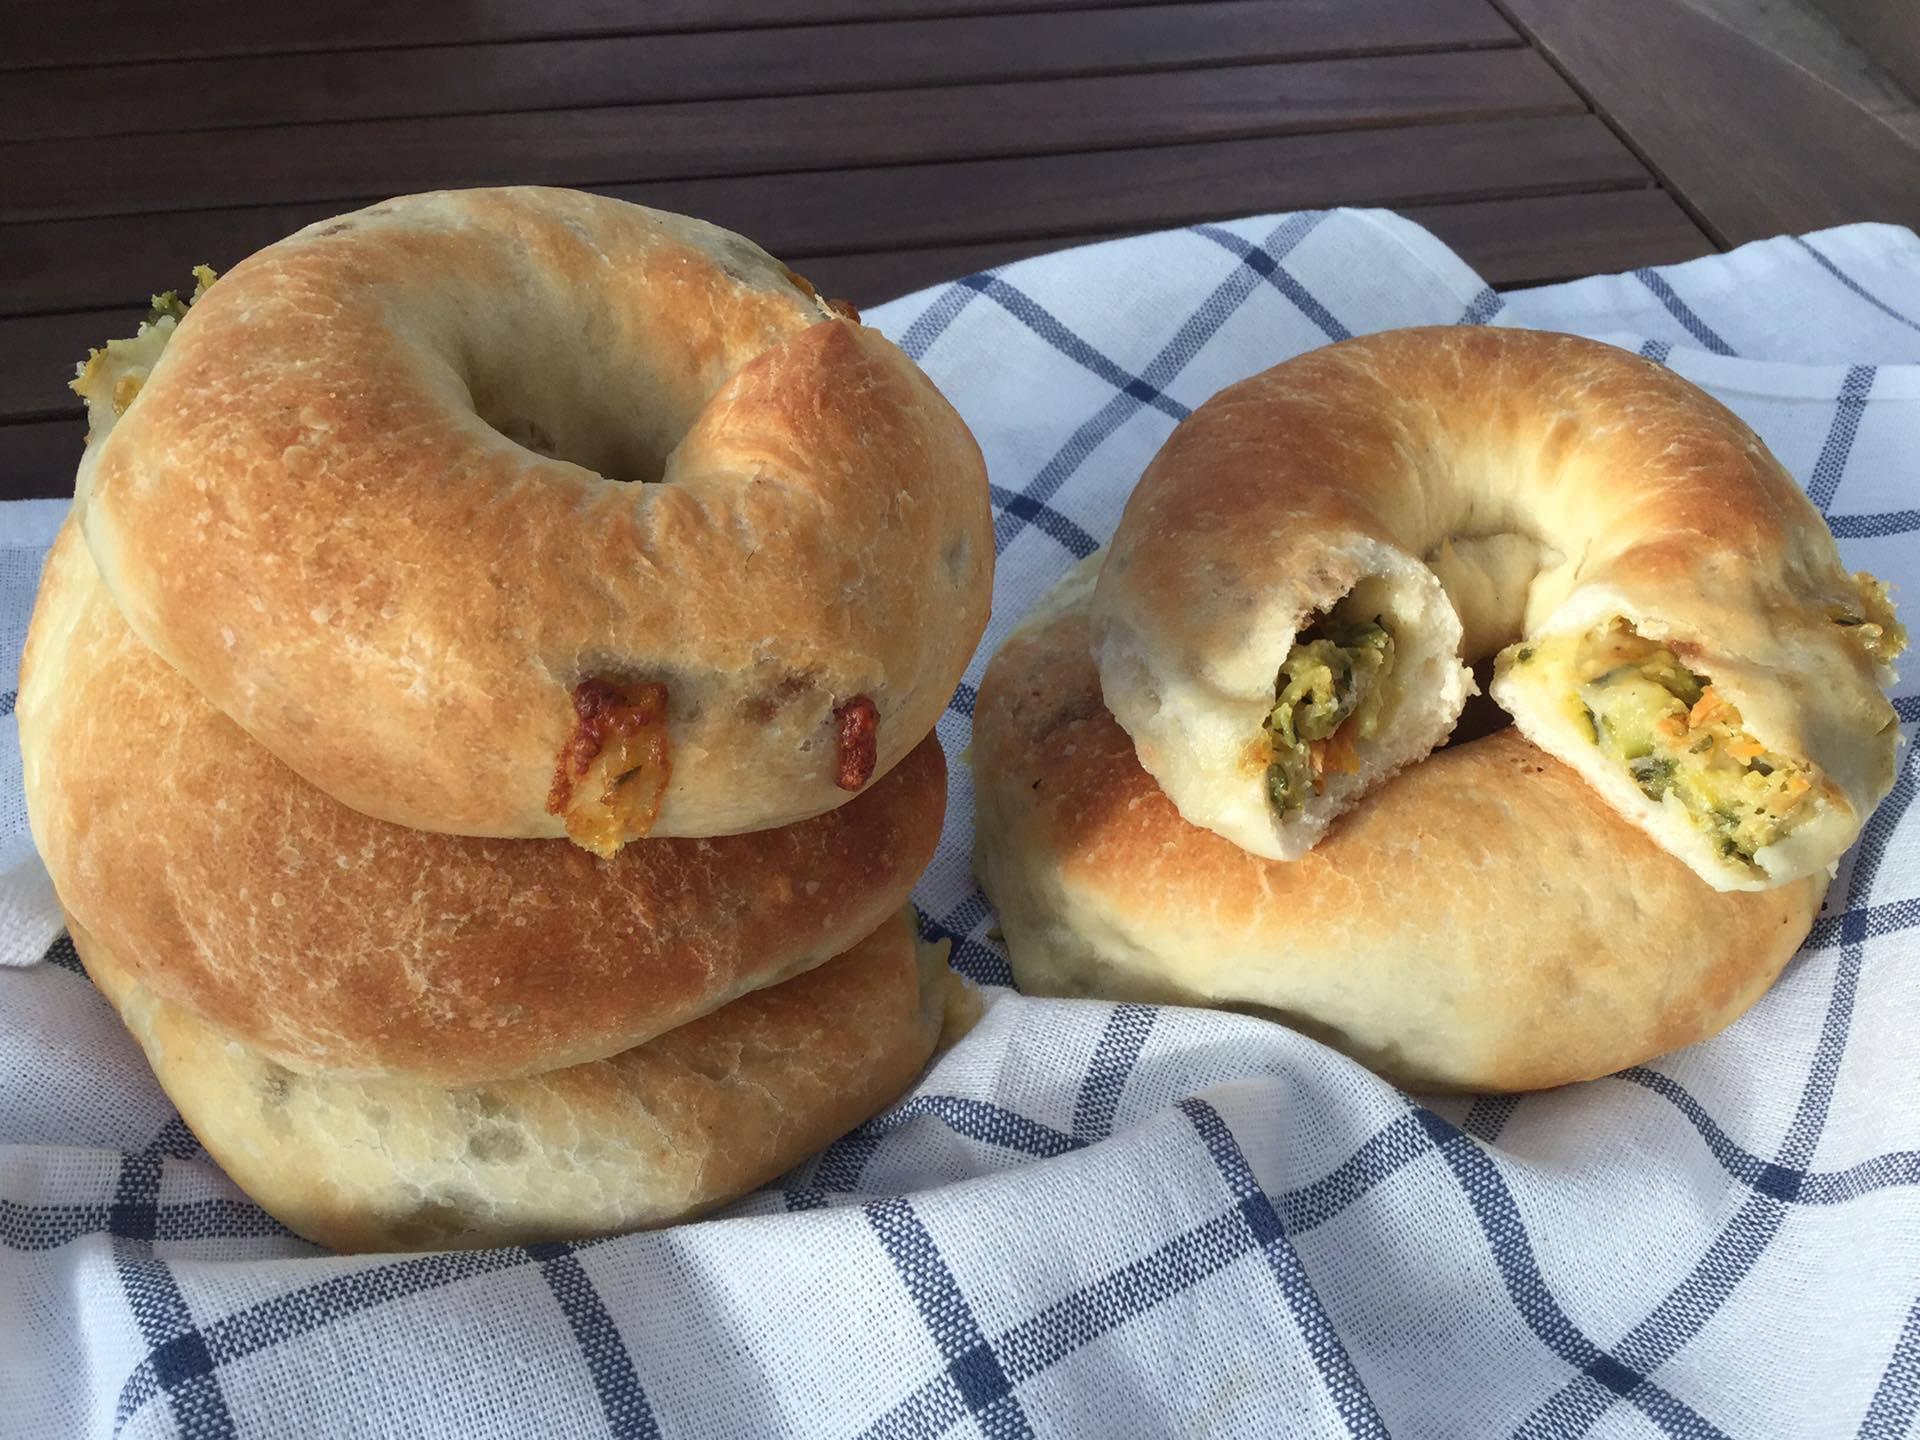 ciambelle lievitate con verdure e Asiago